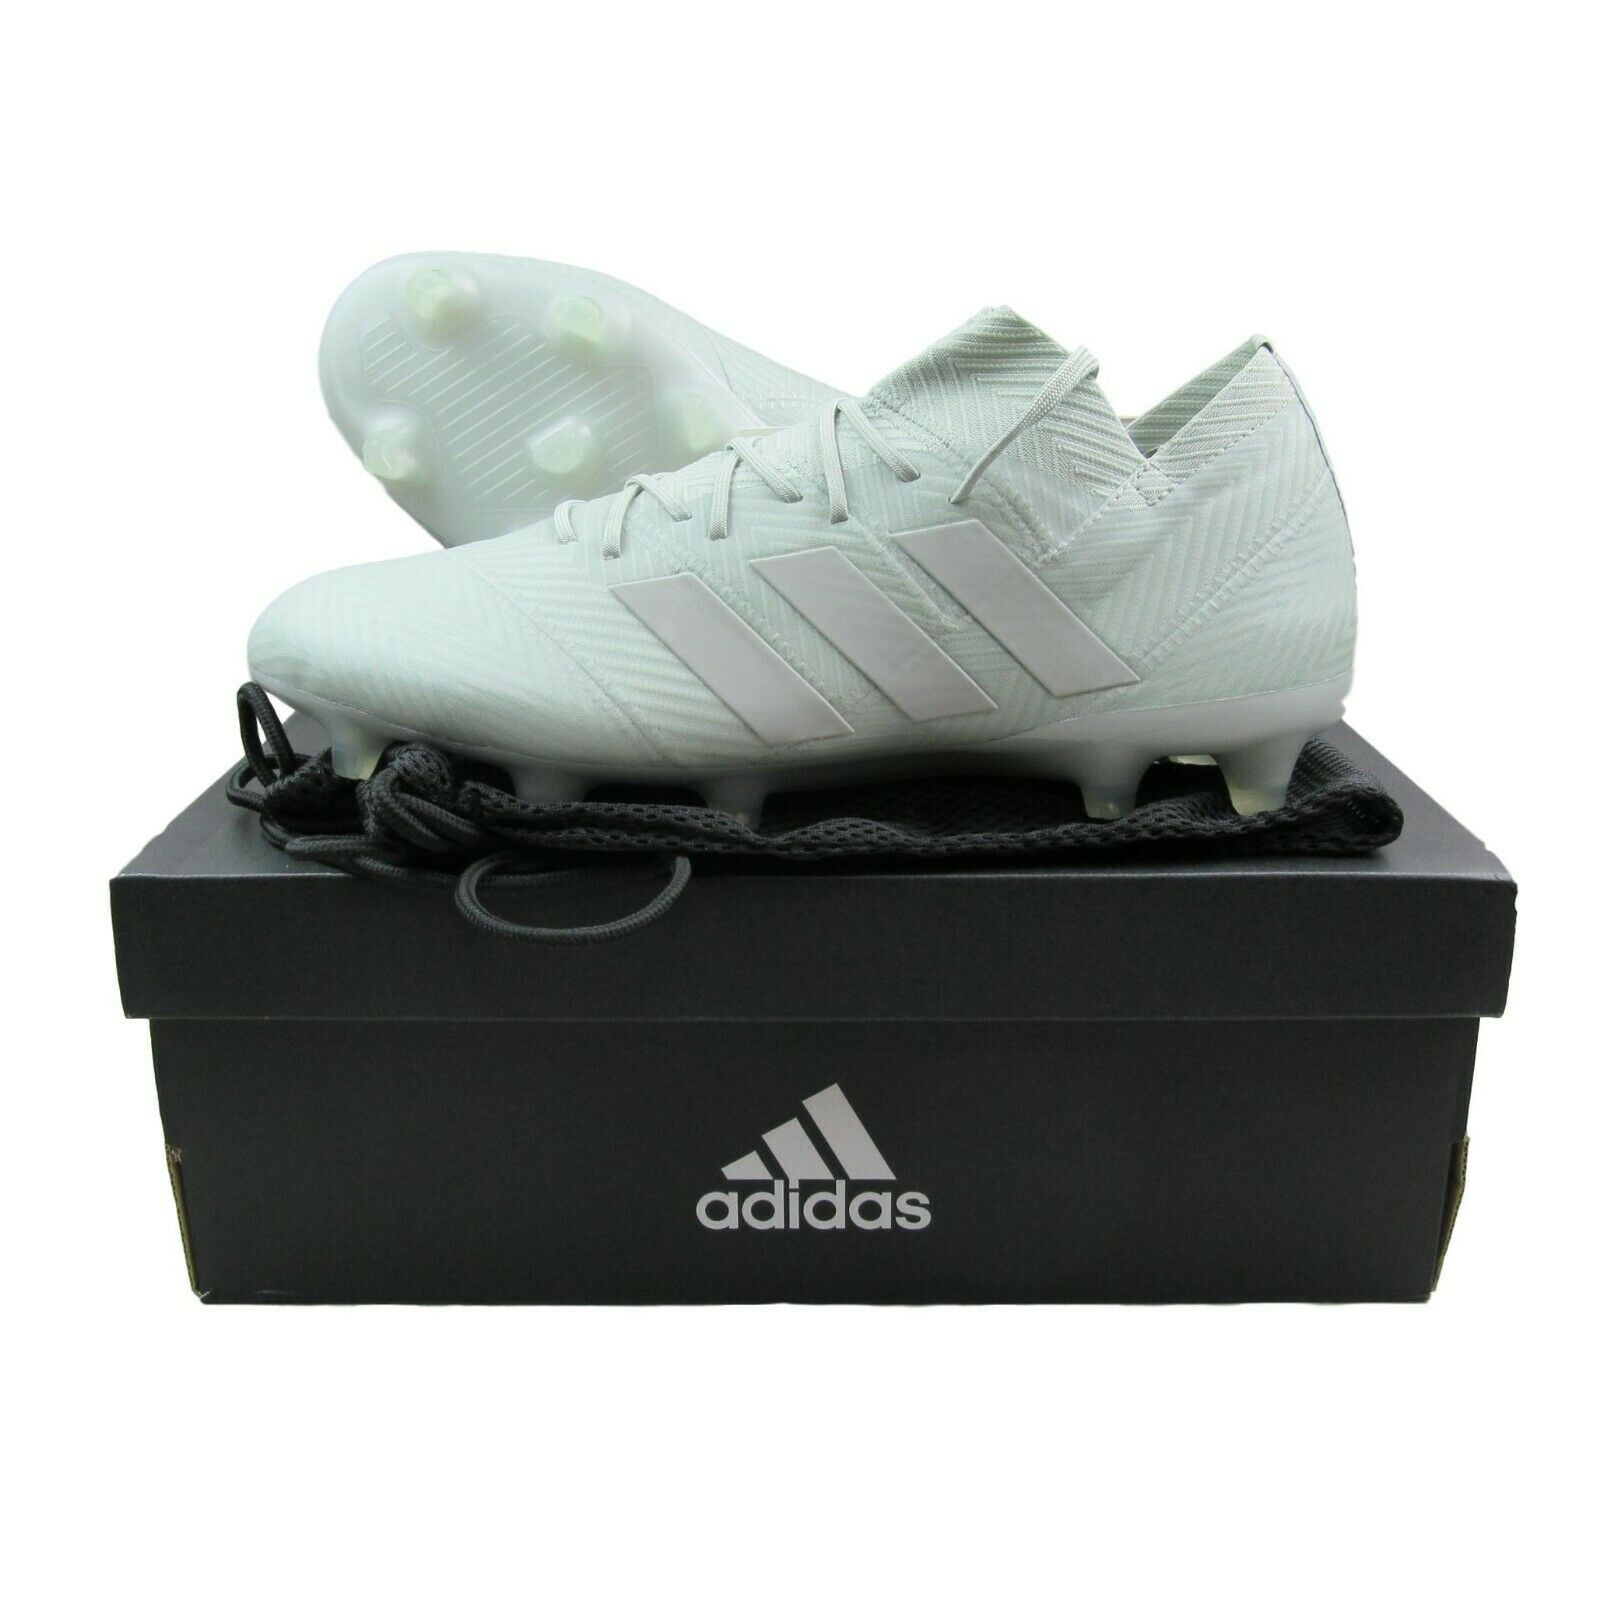 48de3f11c7f4 Adidas Nemeziz 18.1 FG Soccer Cleats Ash Silver Size 9 Mens DB2081